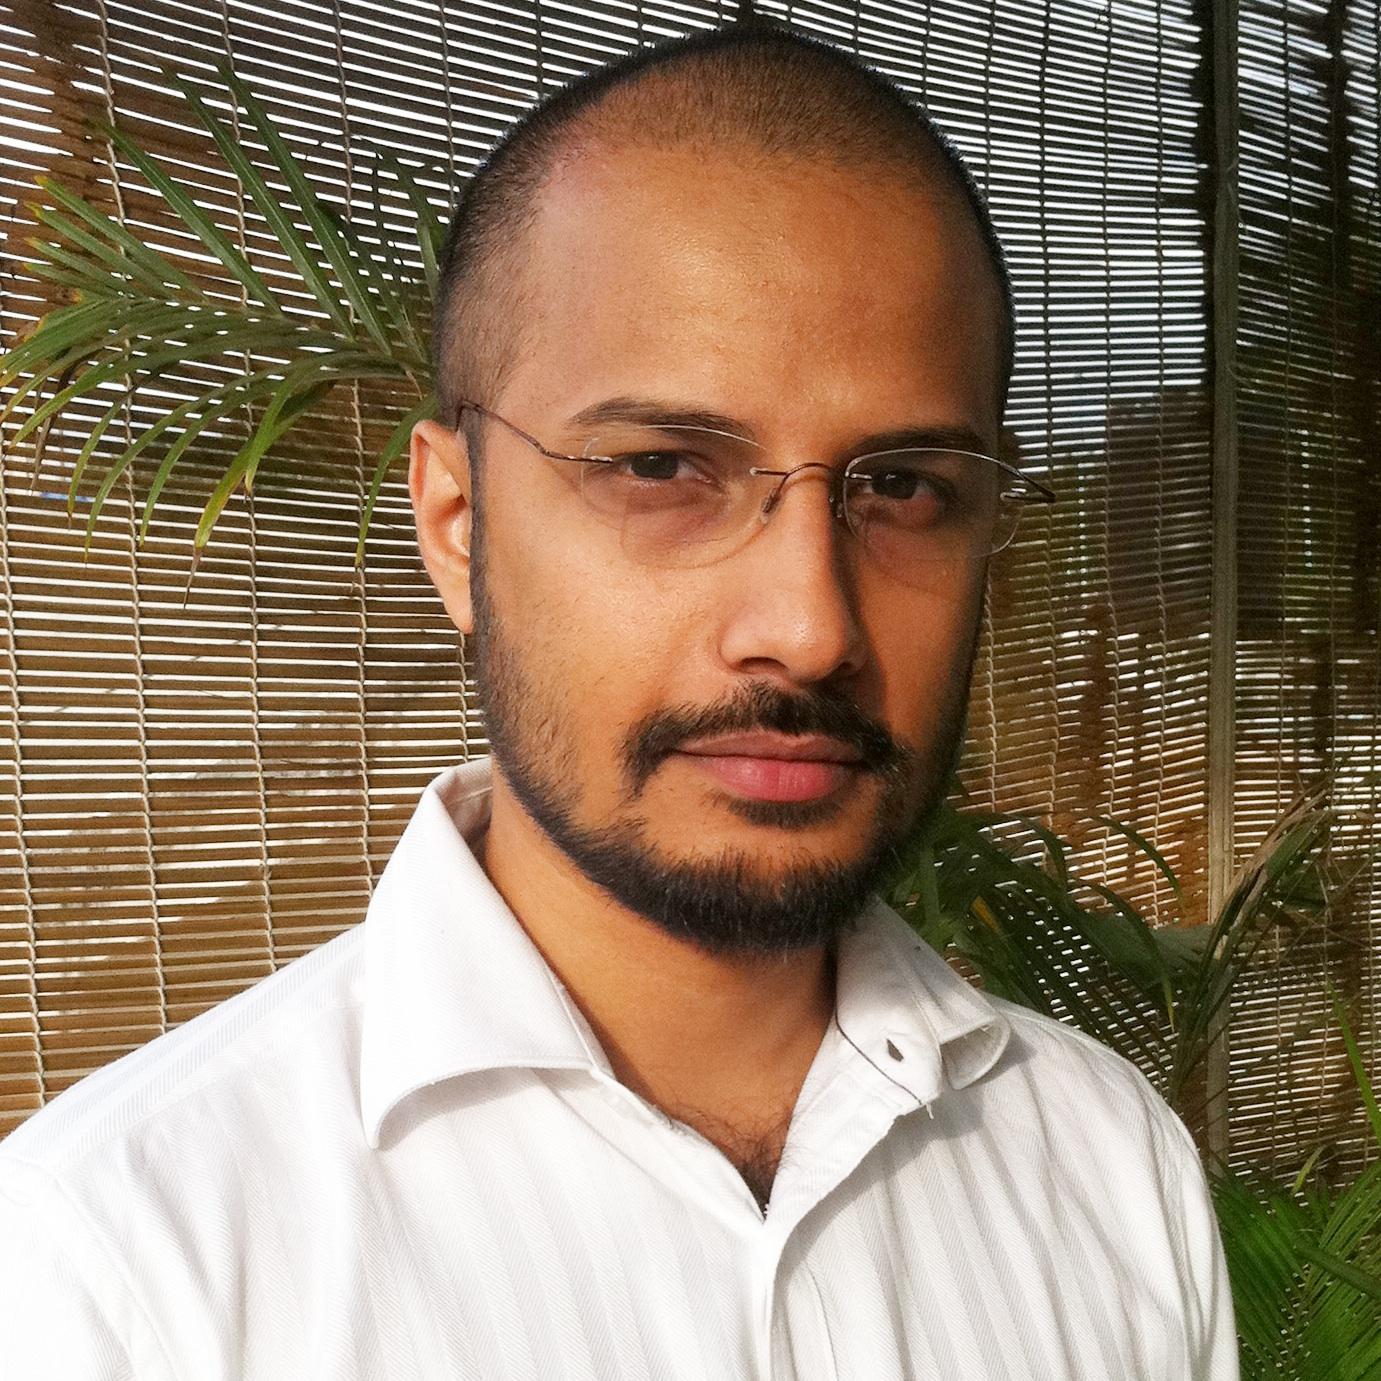 Bharani Setlur webfluenz